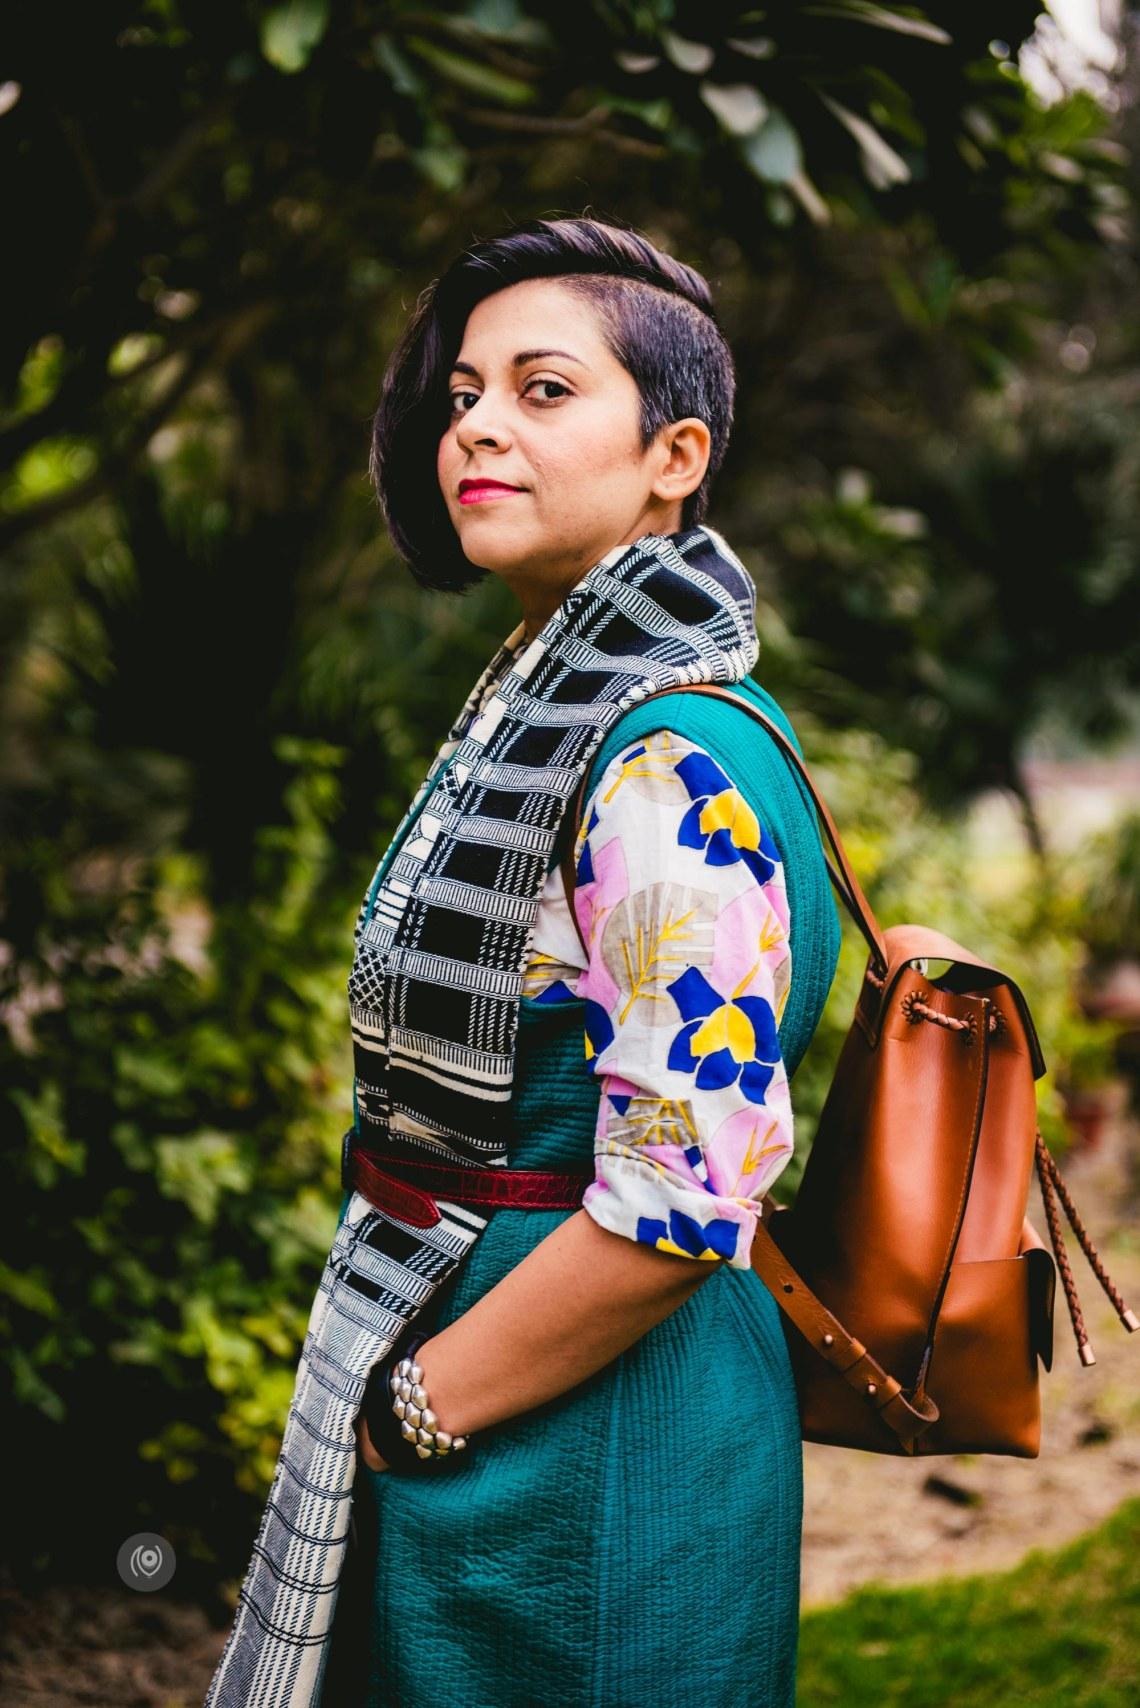 #CoverUp 62 #MadeInIndia with The Jodi Life, Vitasta, Tokree Jaipur, Fizzy Goblet, Urmool Marusthali Bunkar Vikaas Samiti, HiDesign, Naina.co, Naina Redhu, Luxury Photographer, Lifestyle Photographer, Luxury Blogger, Lifestyle Blogger, Experience Collector, Personal Style, #MadeInIndia, #CoverUp